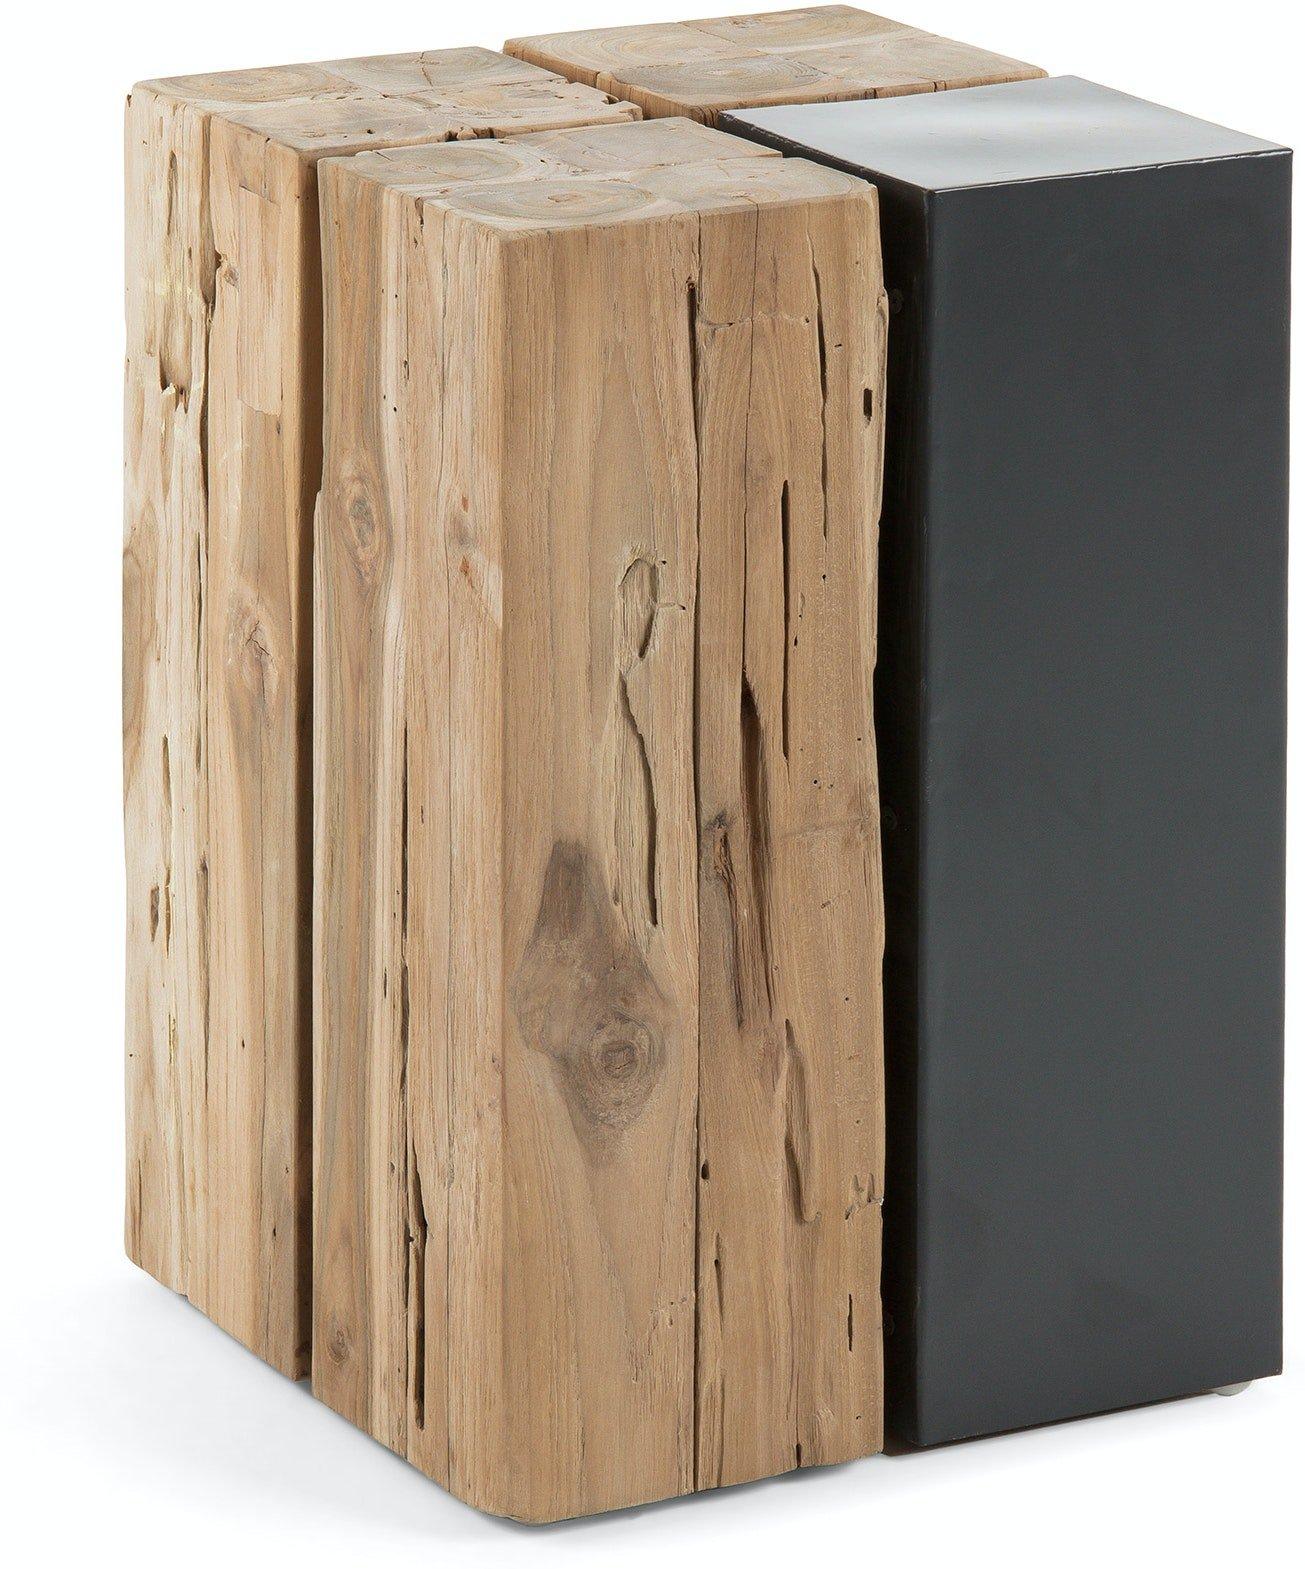 Kwango, Sidebord, Teaktræ by LaForma (H: 42.5 cm. B: 29 cm. L: 29 cm., Natur/Sort)